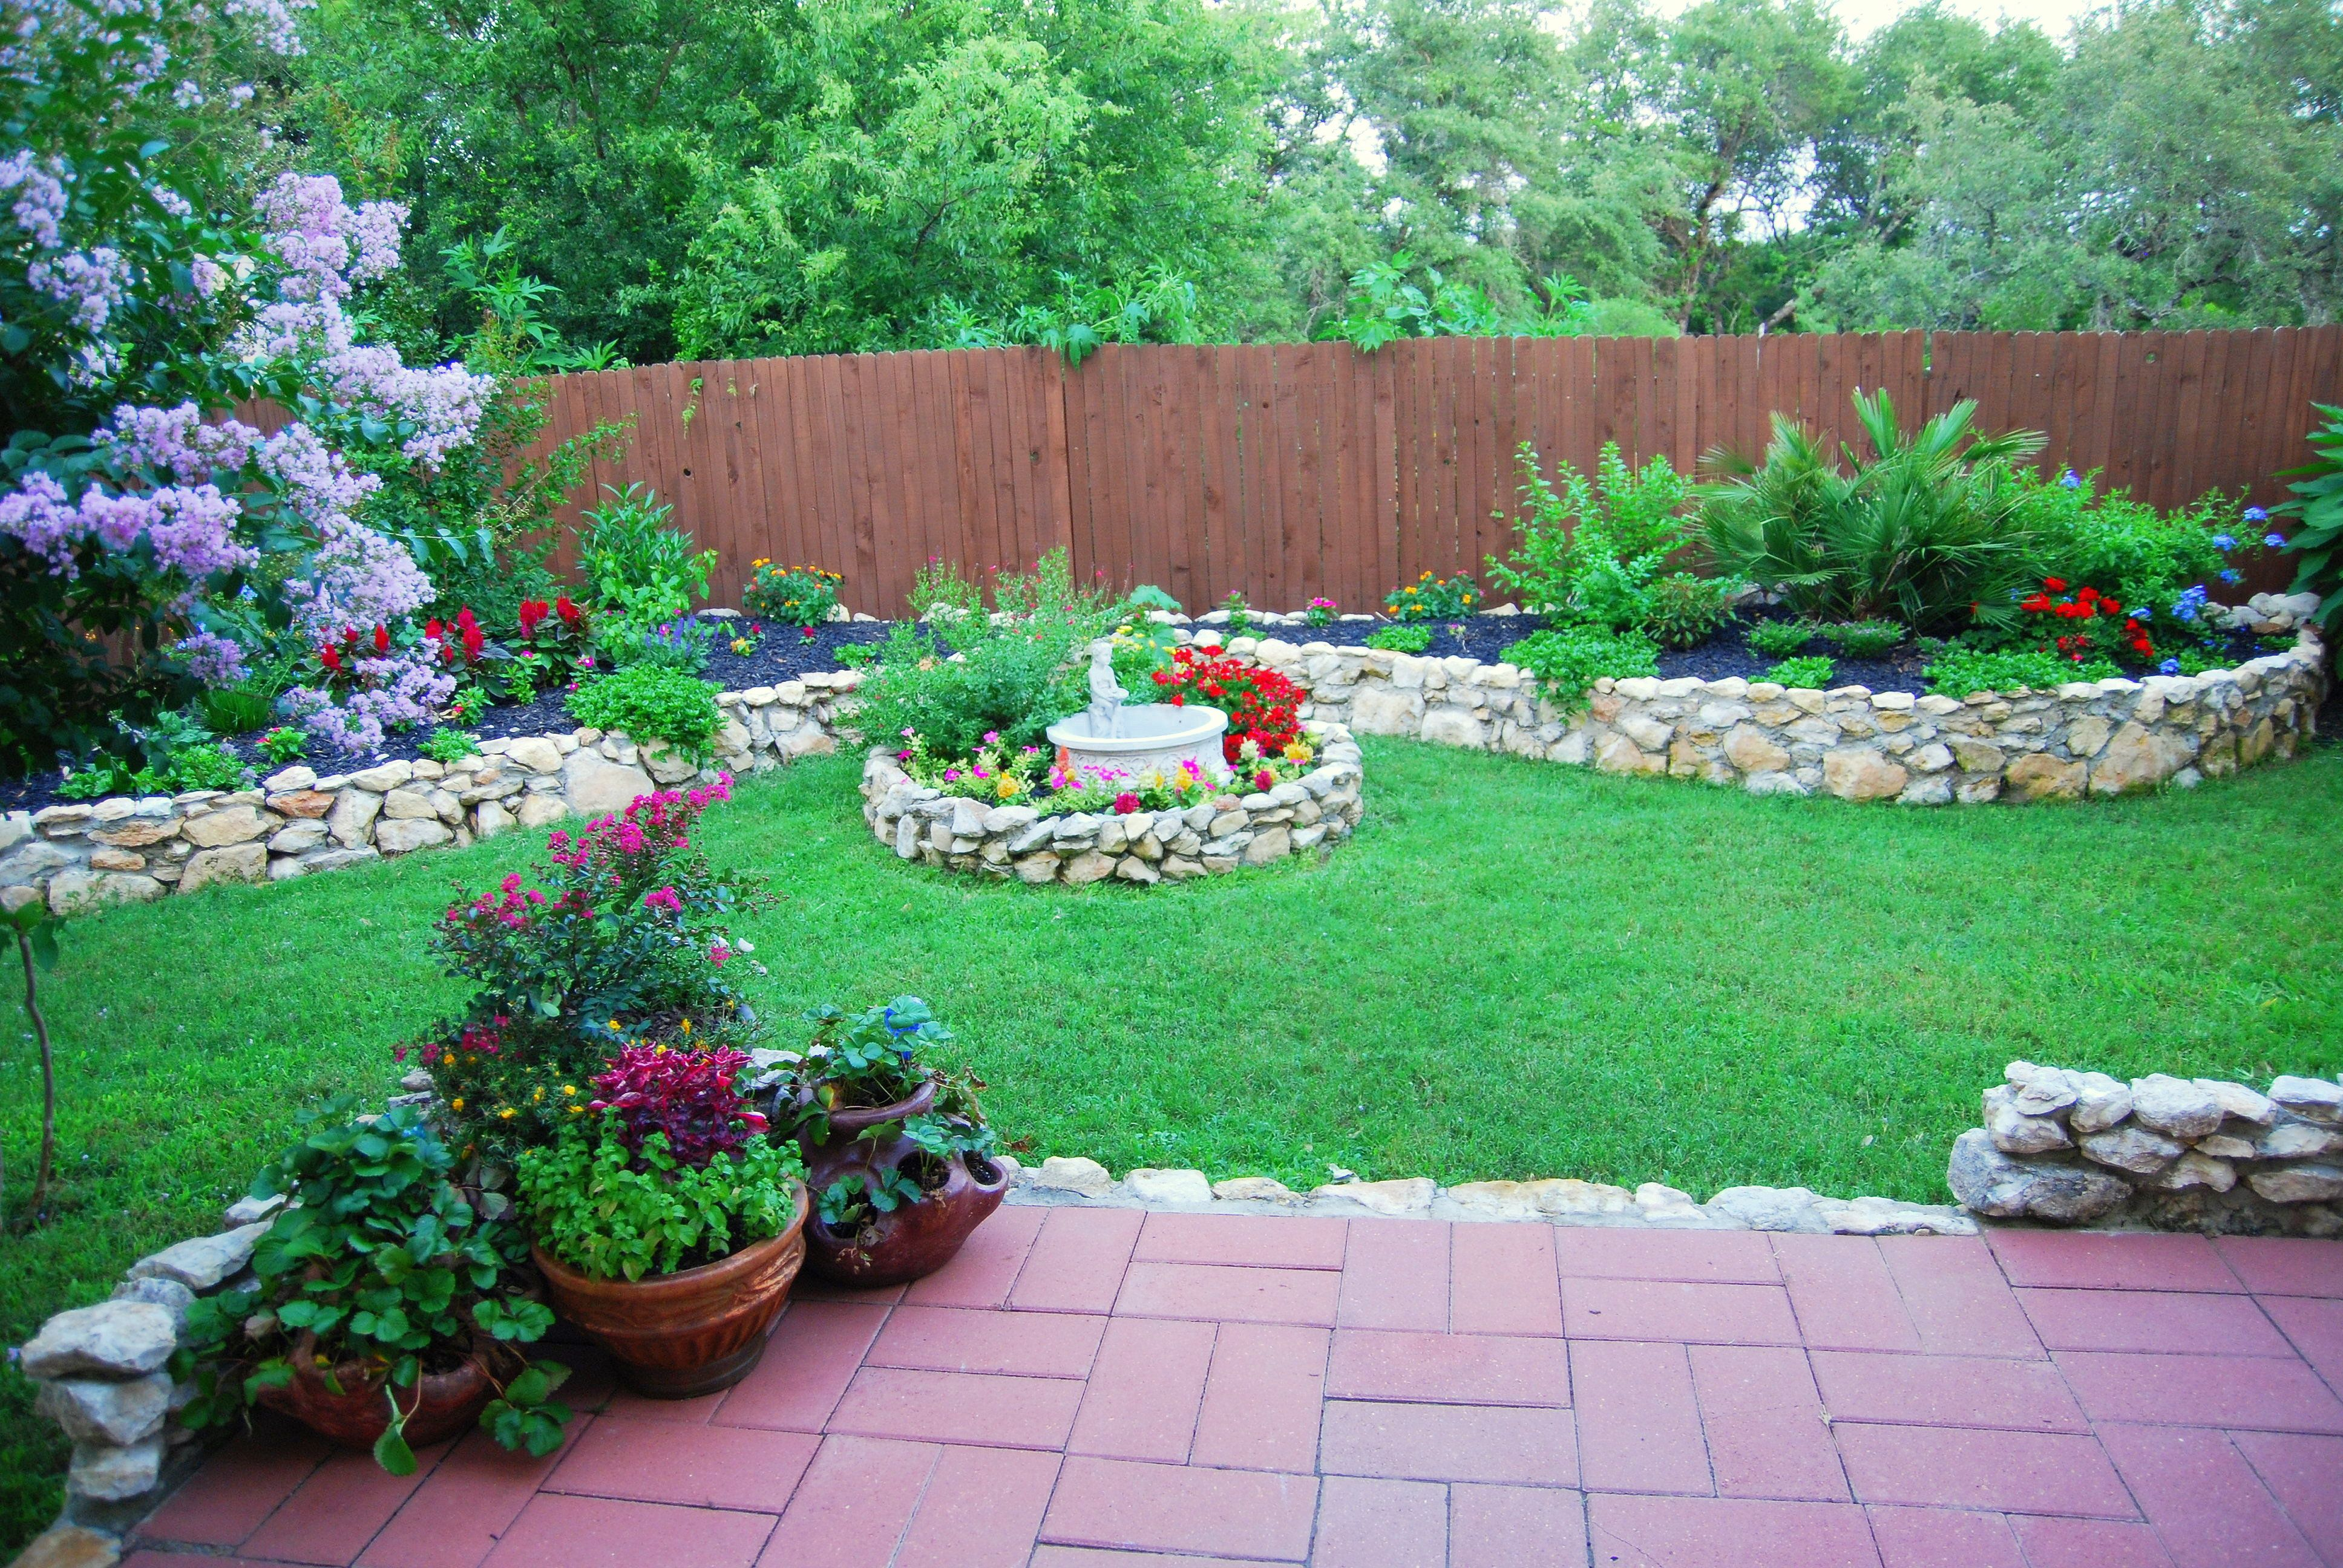 My yard in San Antonio | Garden yard ideas, Plants, Garden